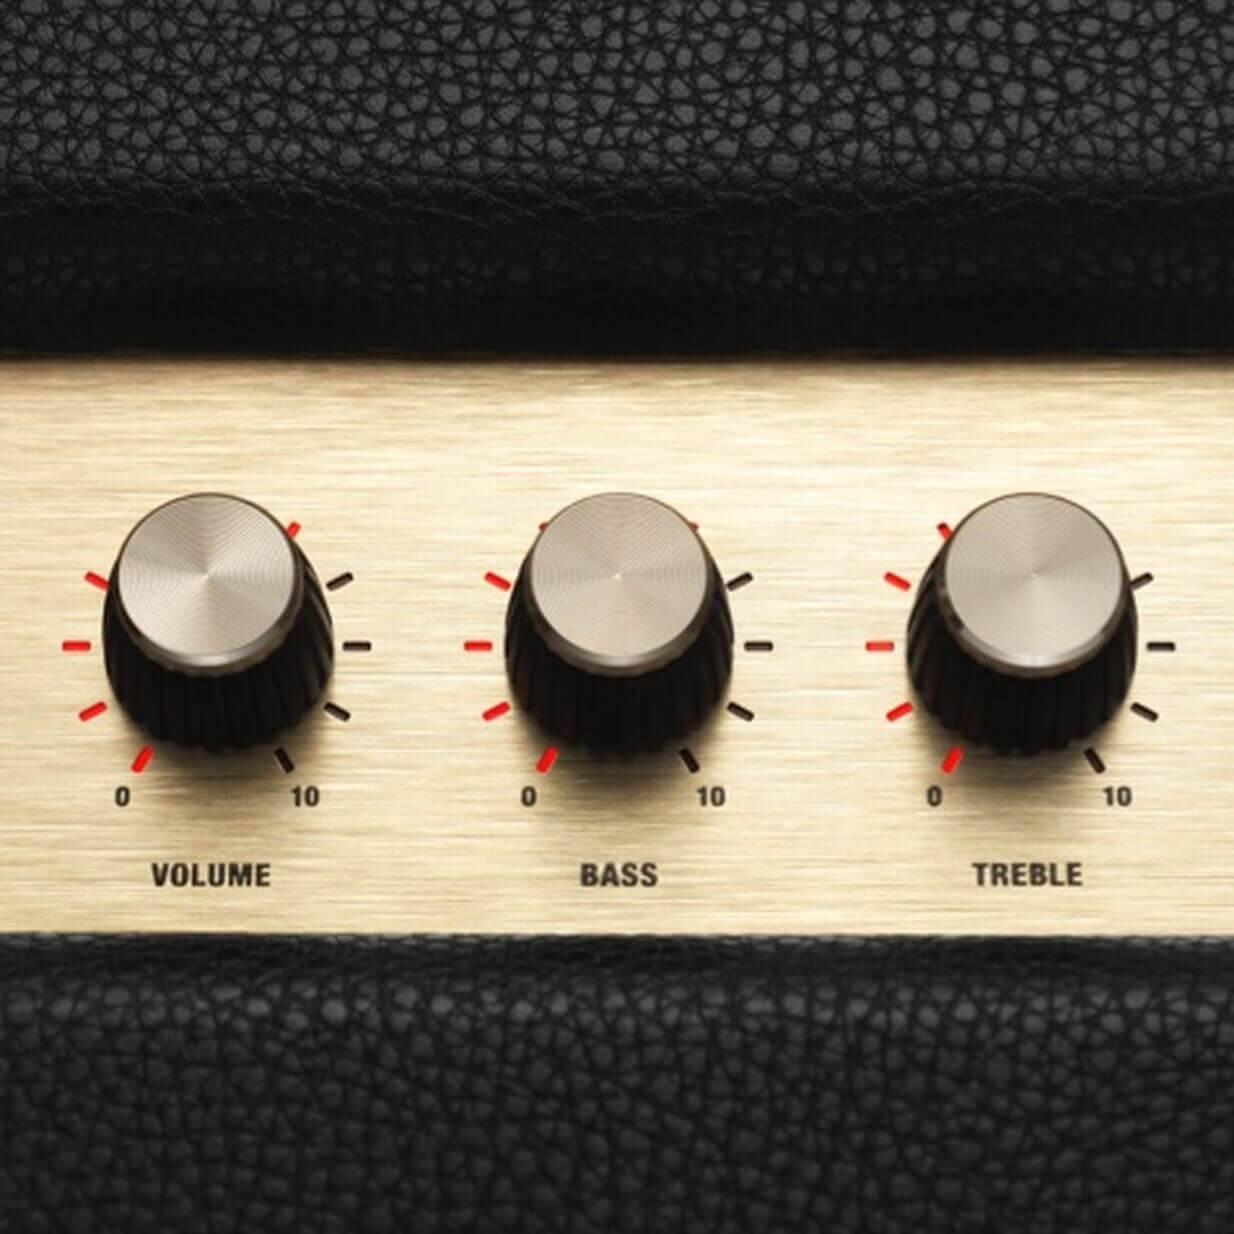 Bass & treble controls